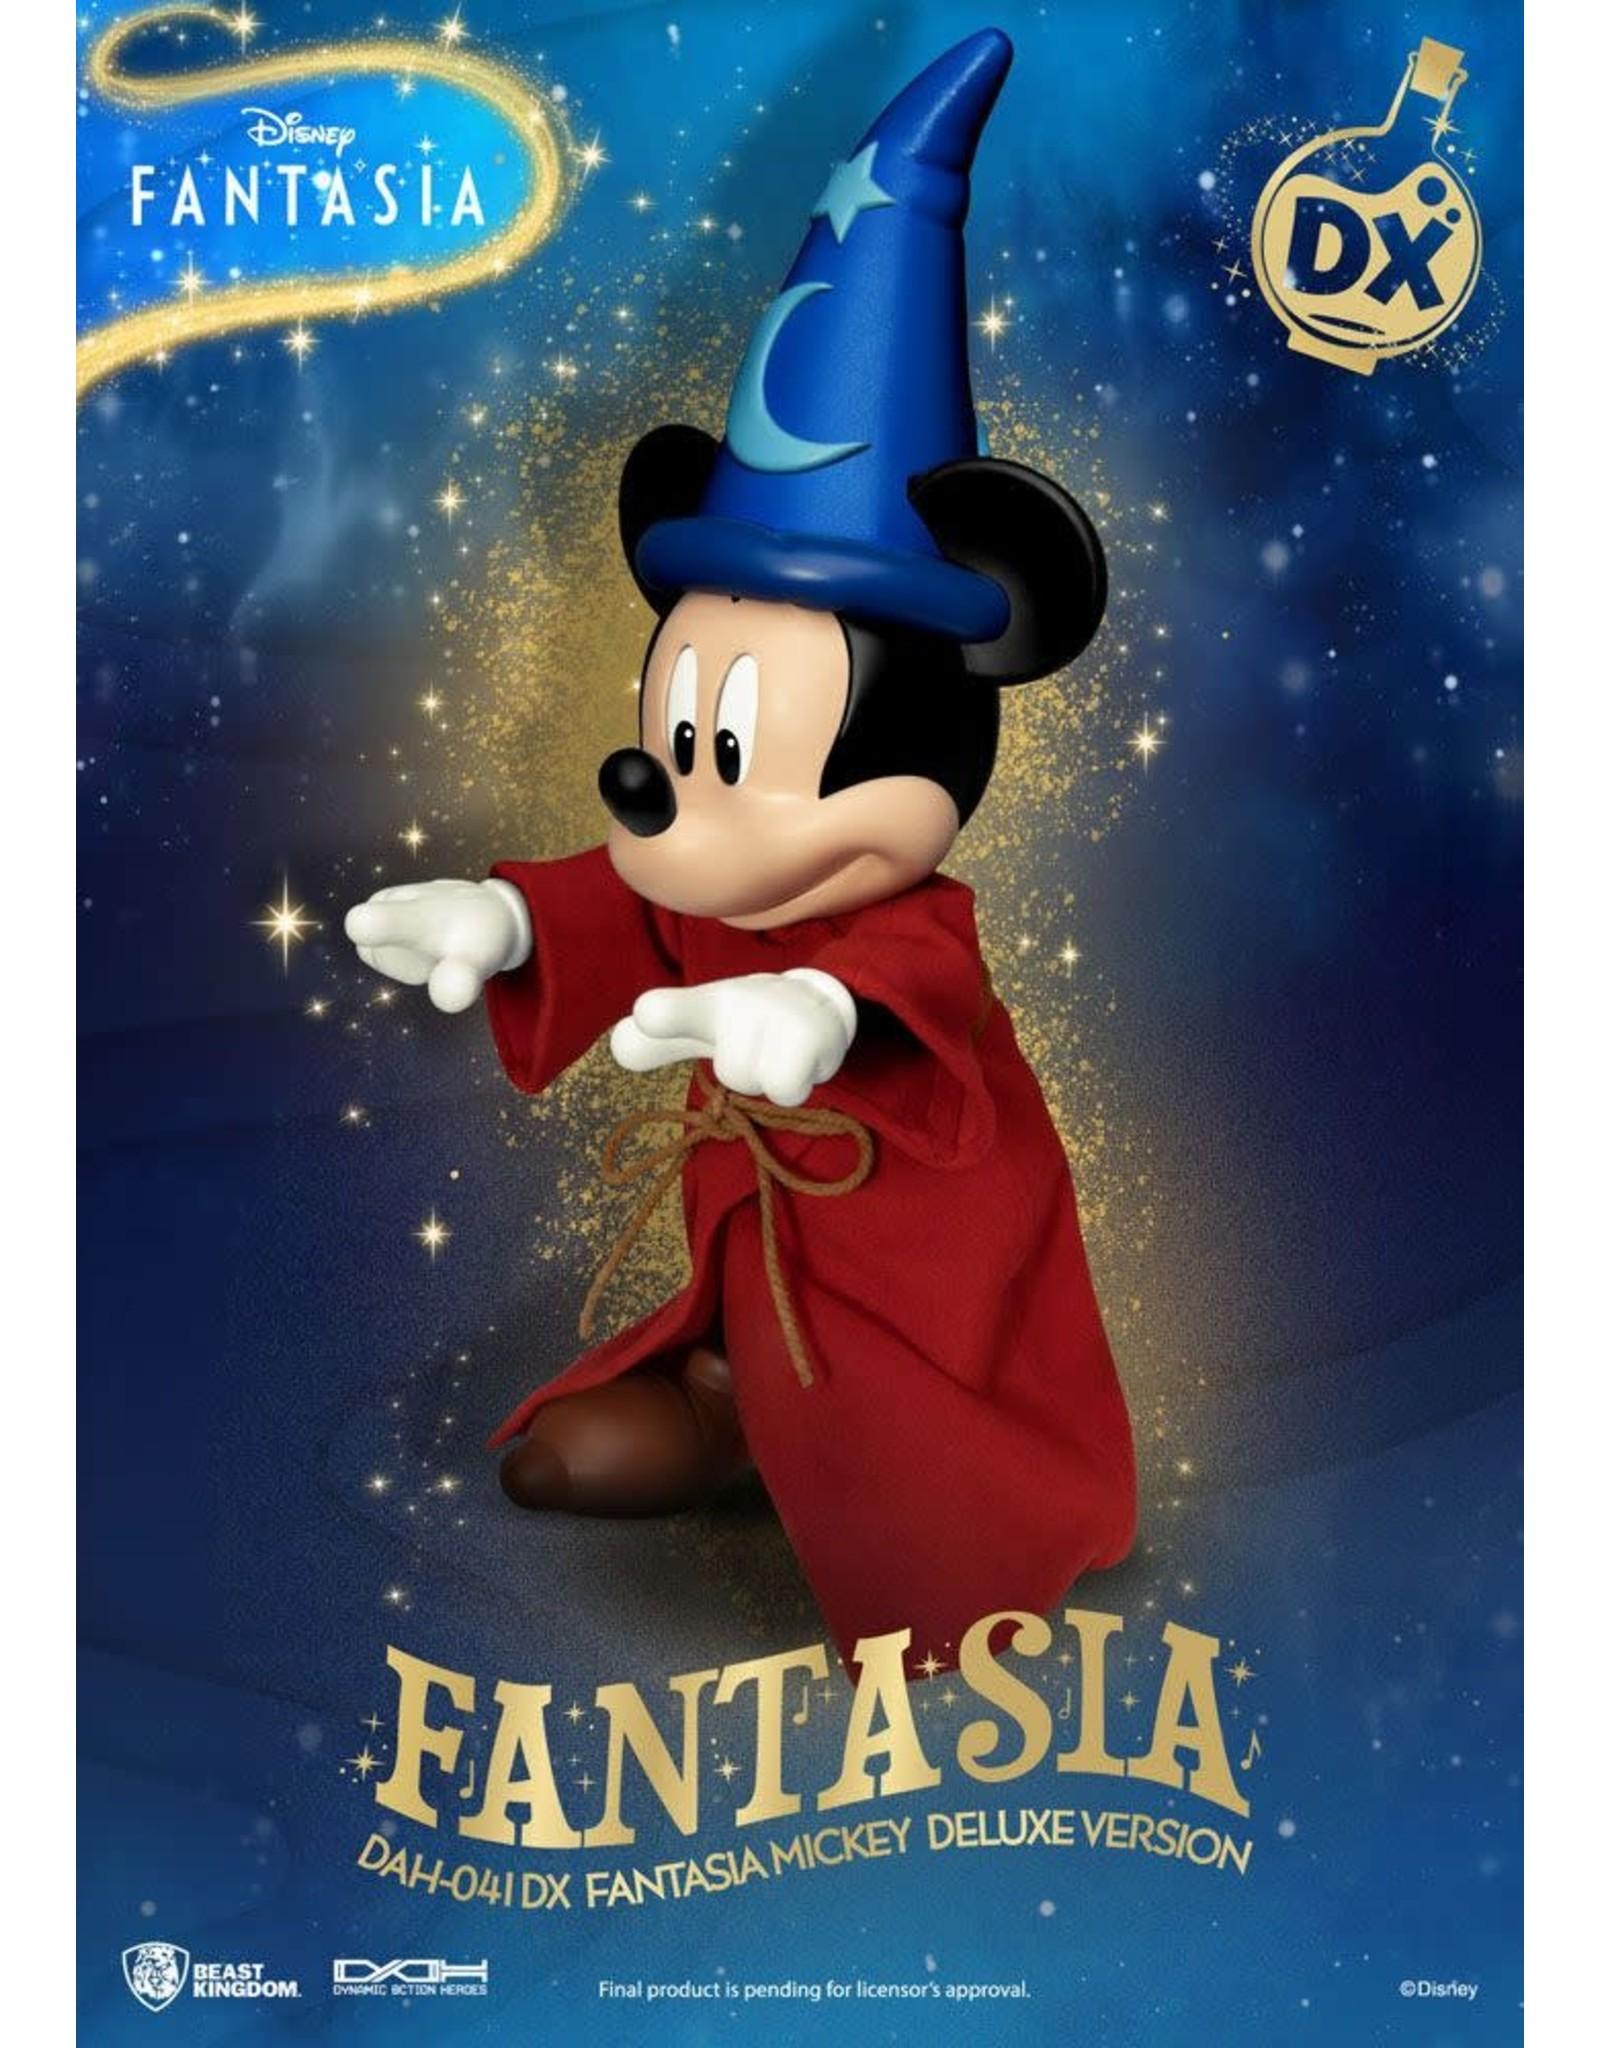 Beast Kingdom FANTASIA Dynamic 8action Heroes figure 21cm - Mickey Fantasia Deluxe Version